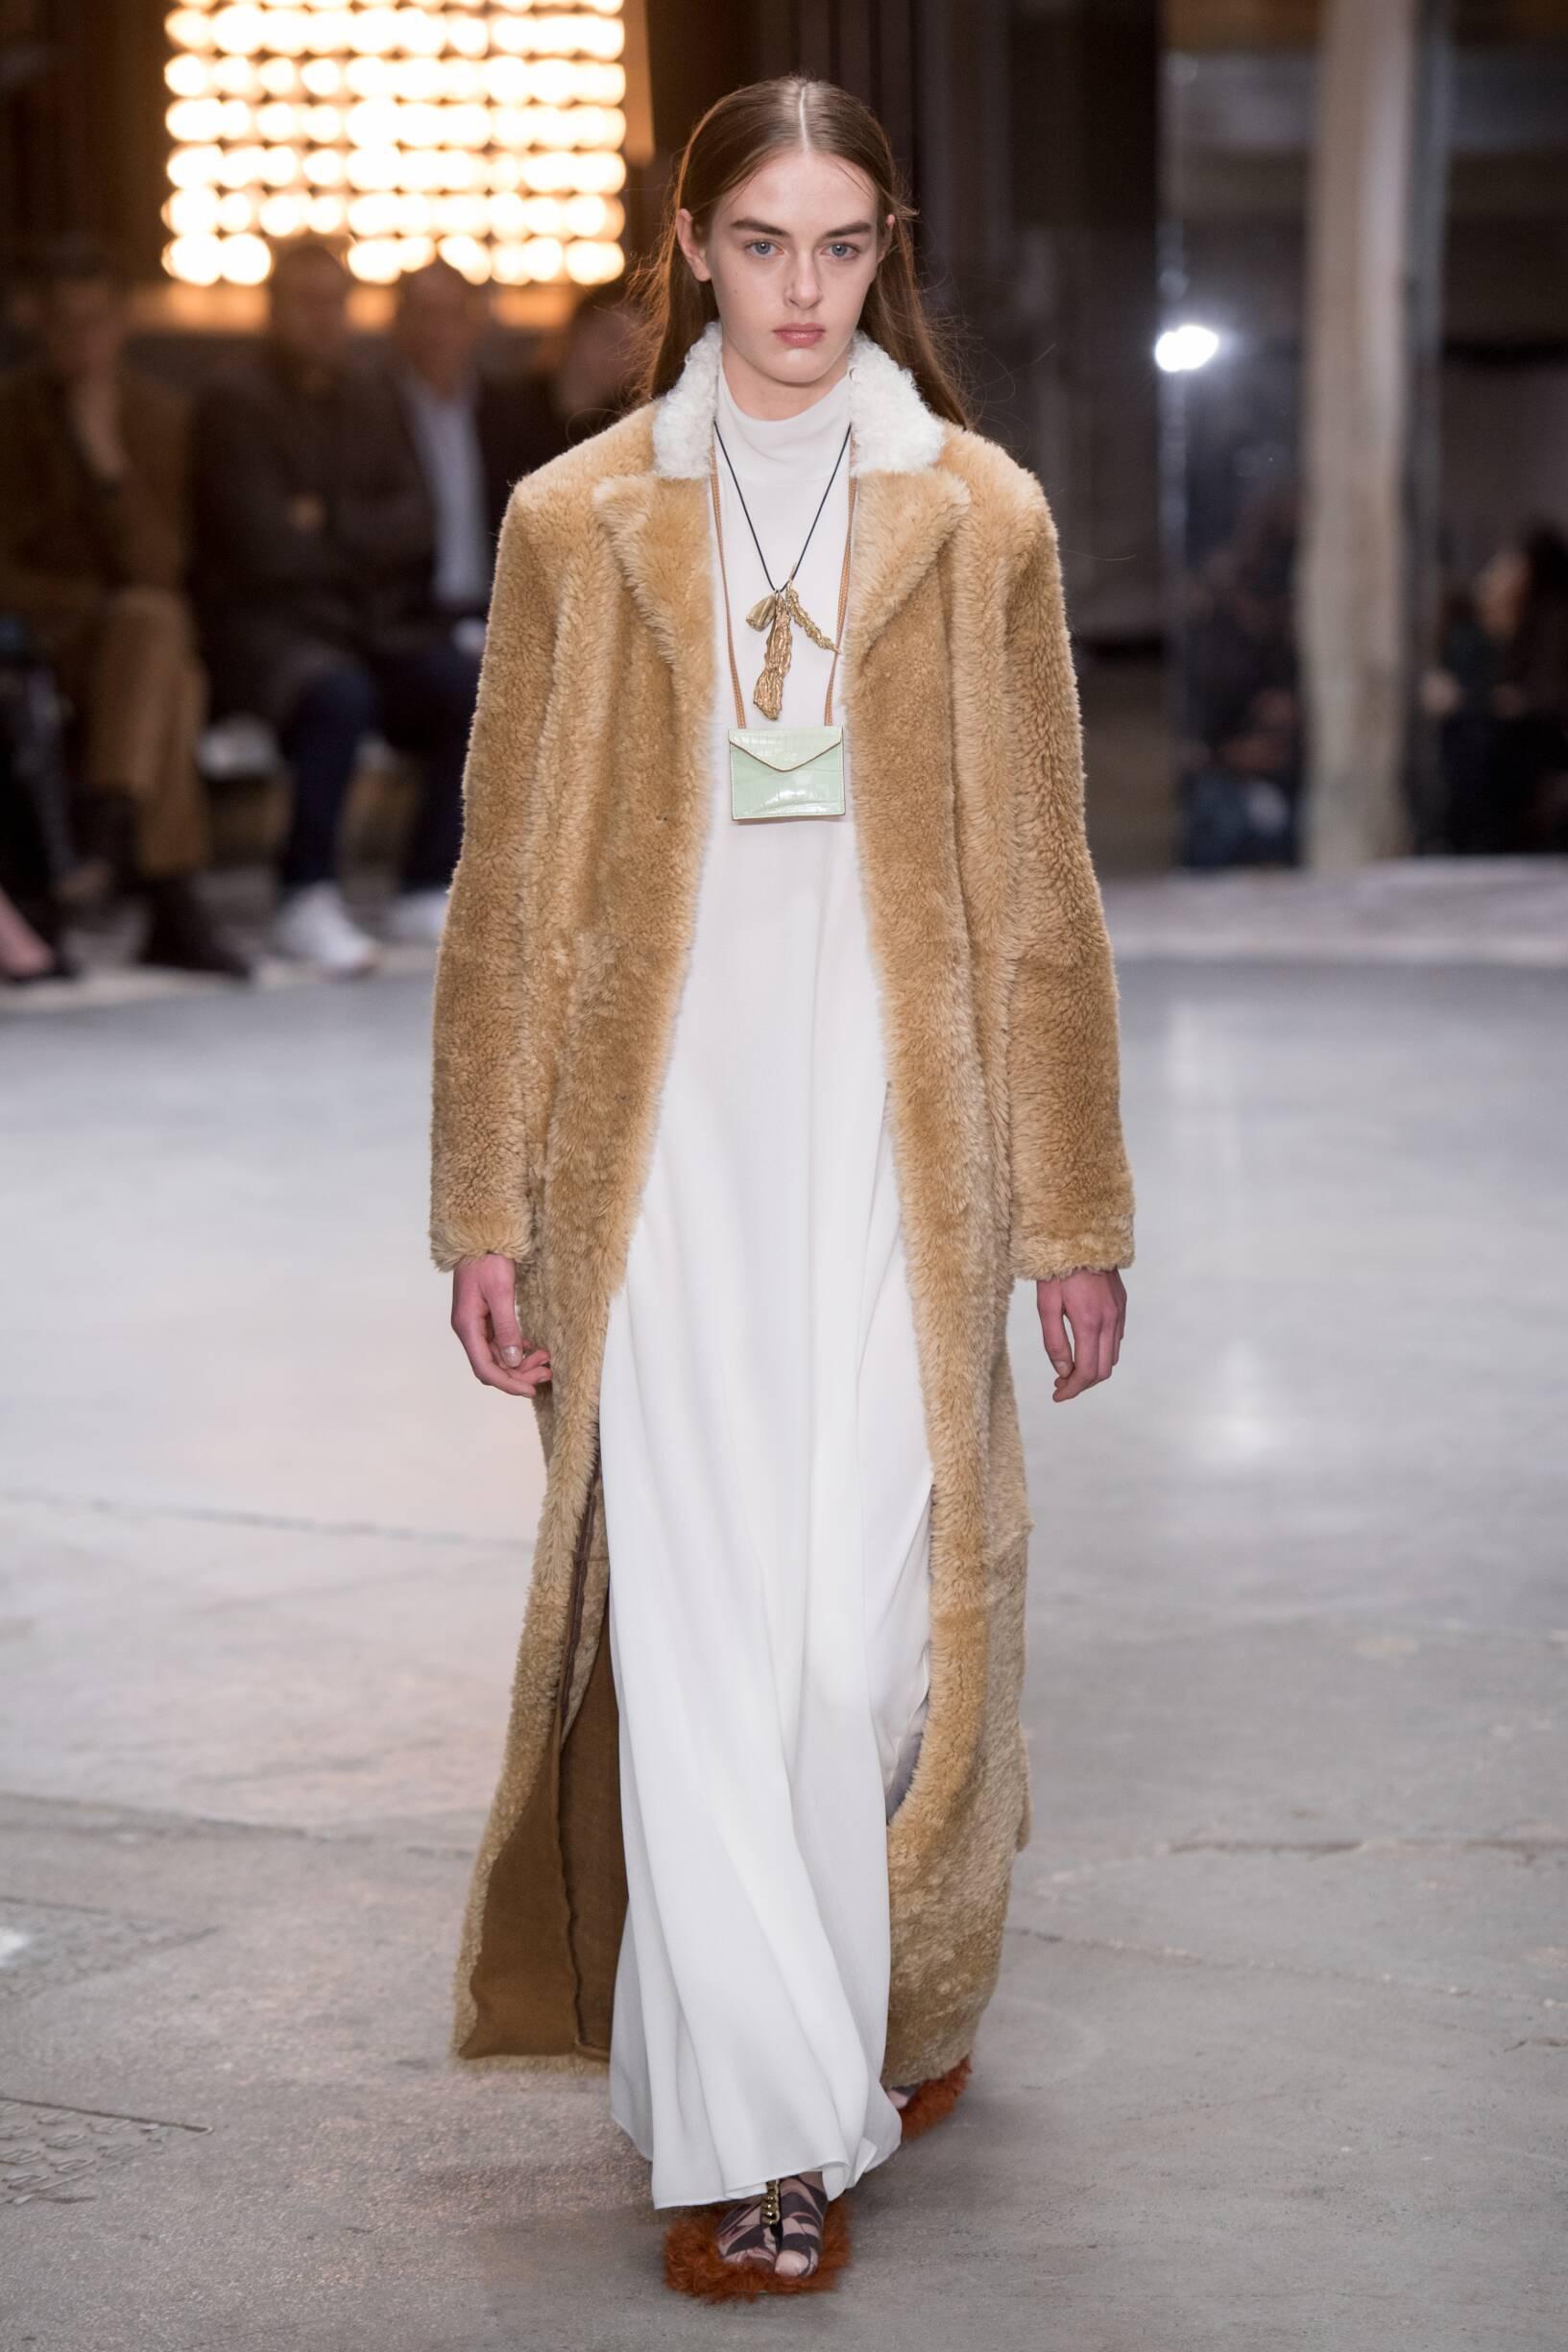 Fashion Model Giambattista Valli Catwalk